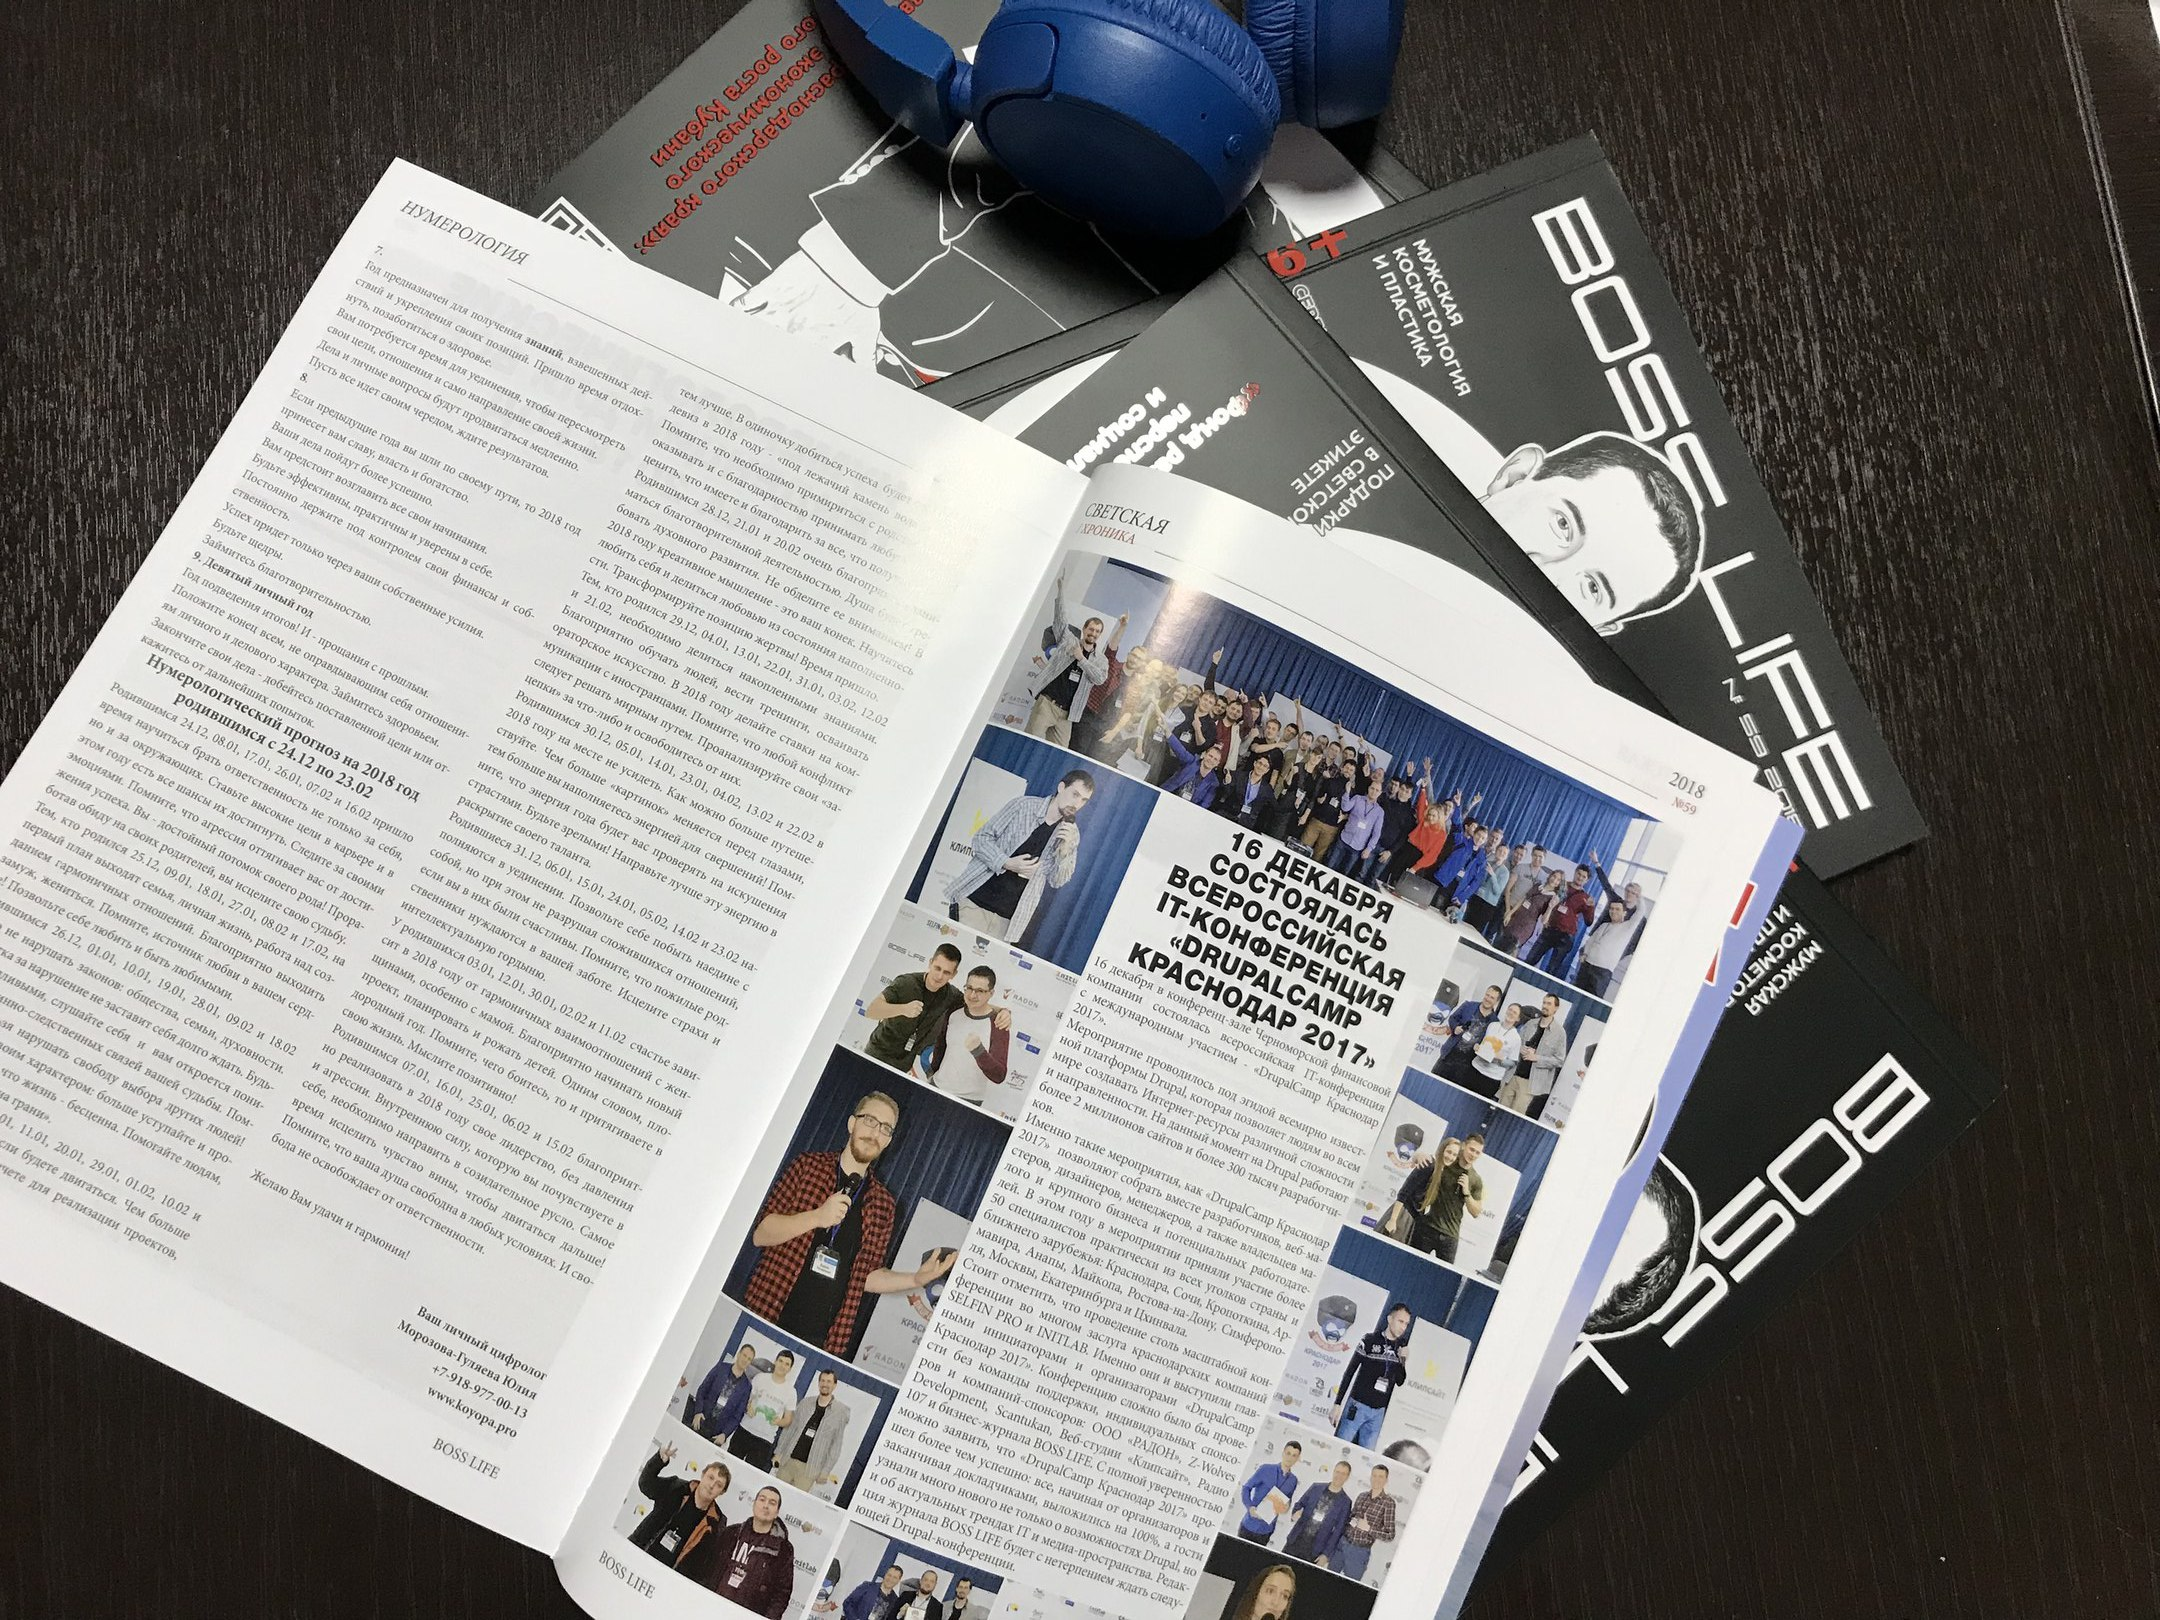 Заметка о DrupalCamp Краснодар 2017 в журнале BOSS LIFE, №59.